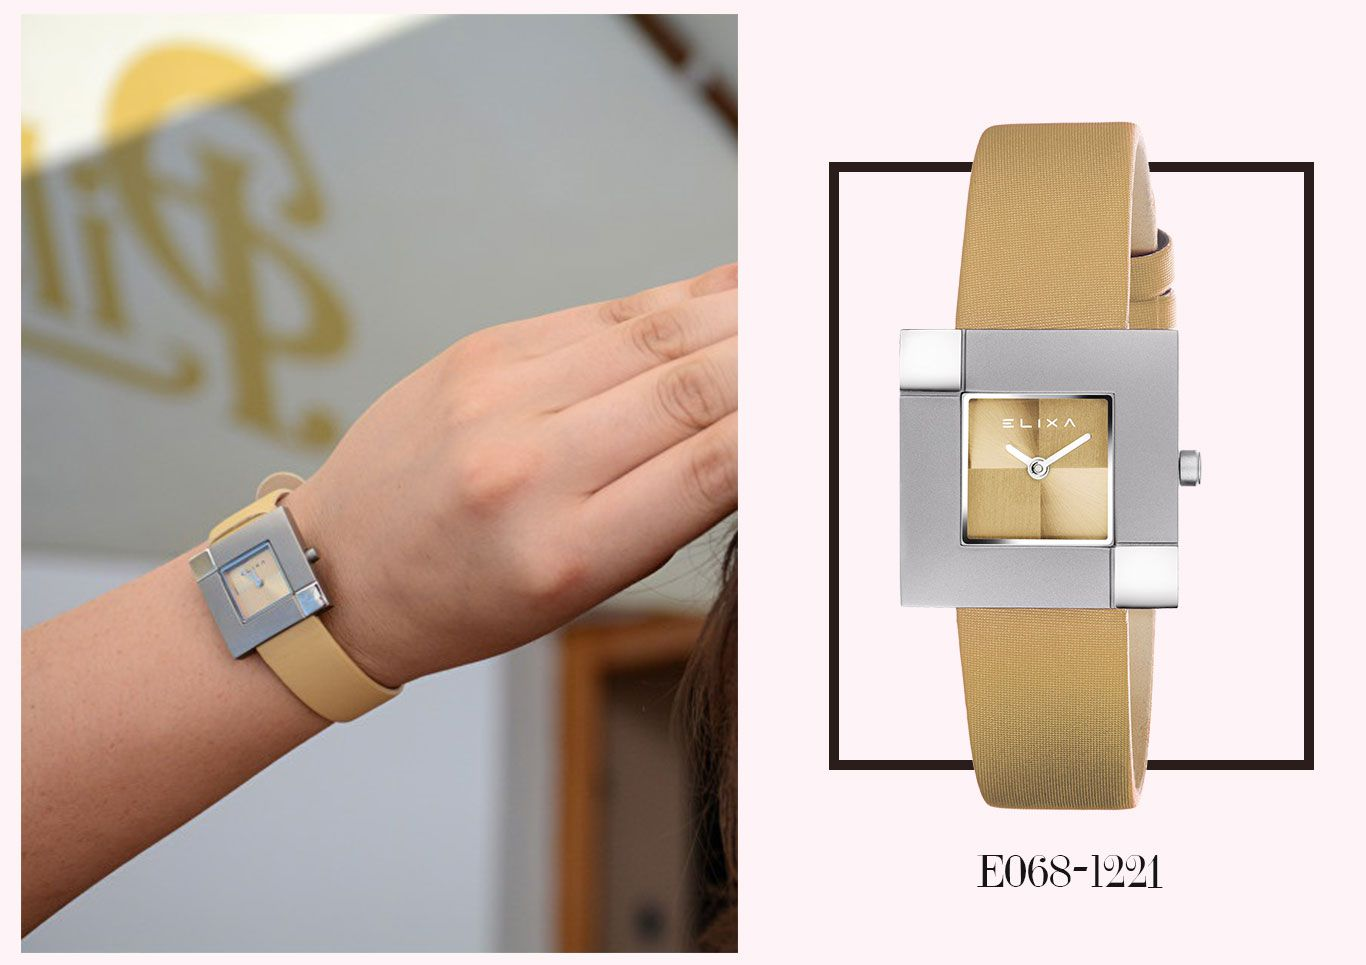 Đồng hồ Elixa E068-l221